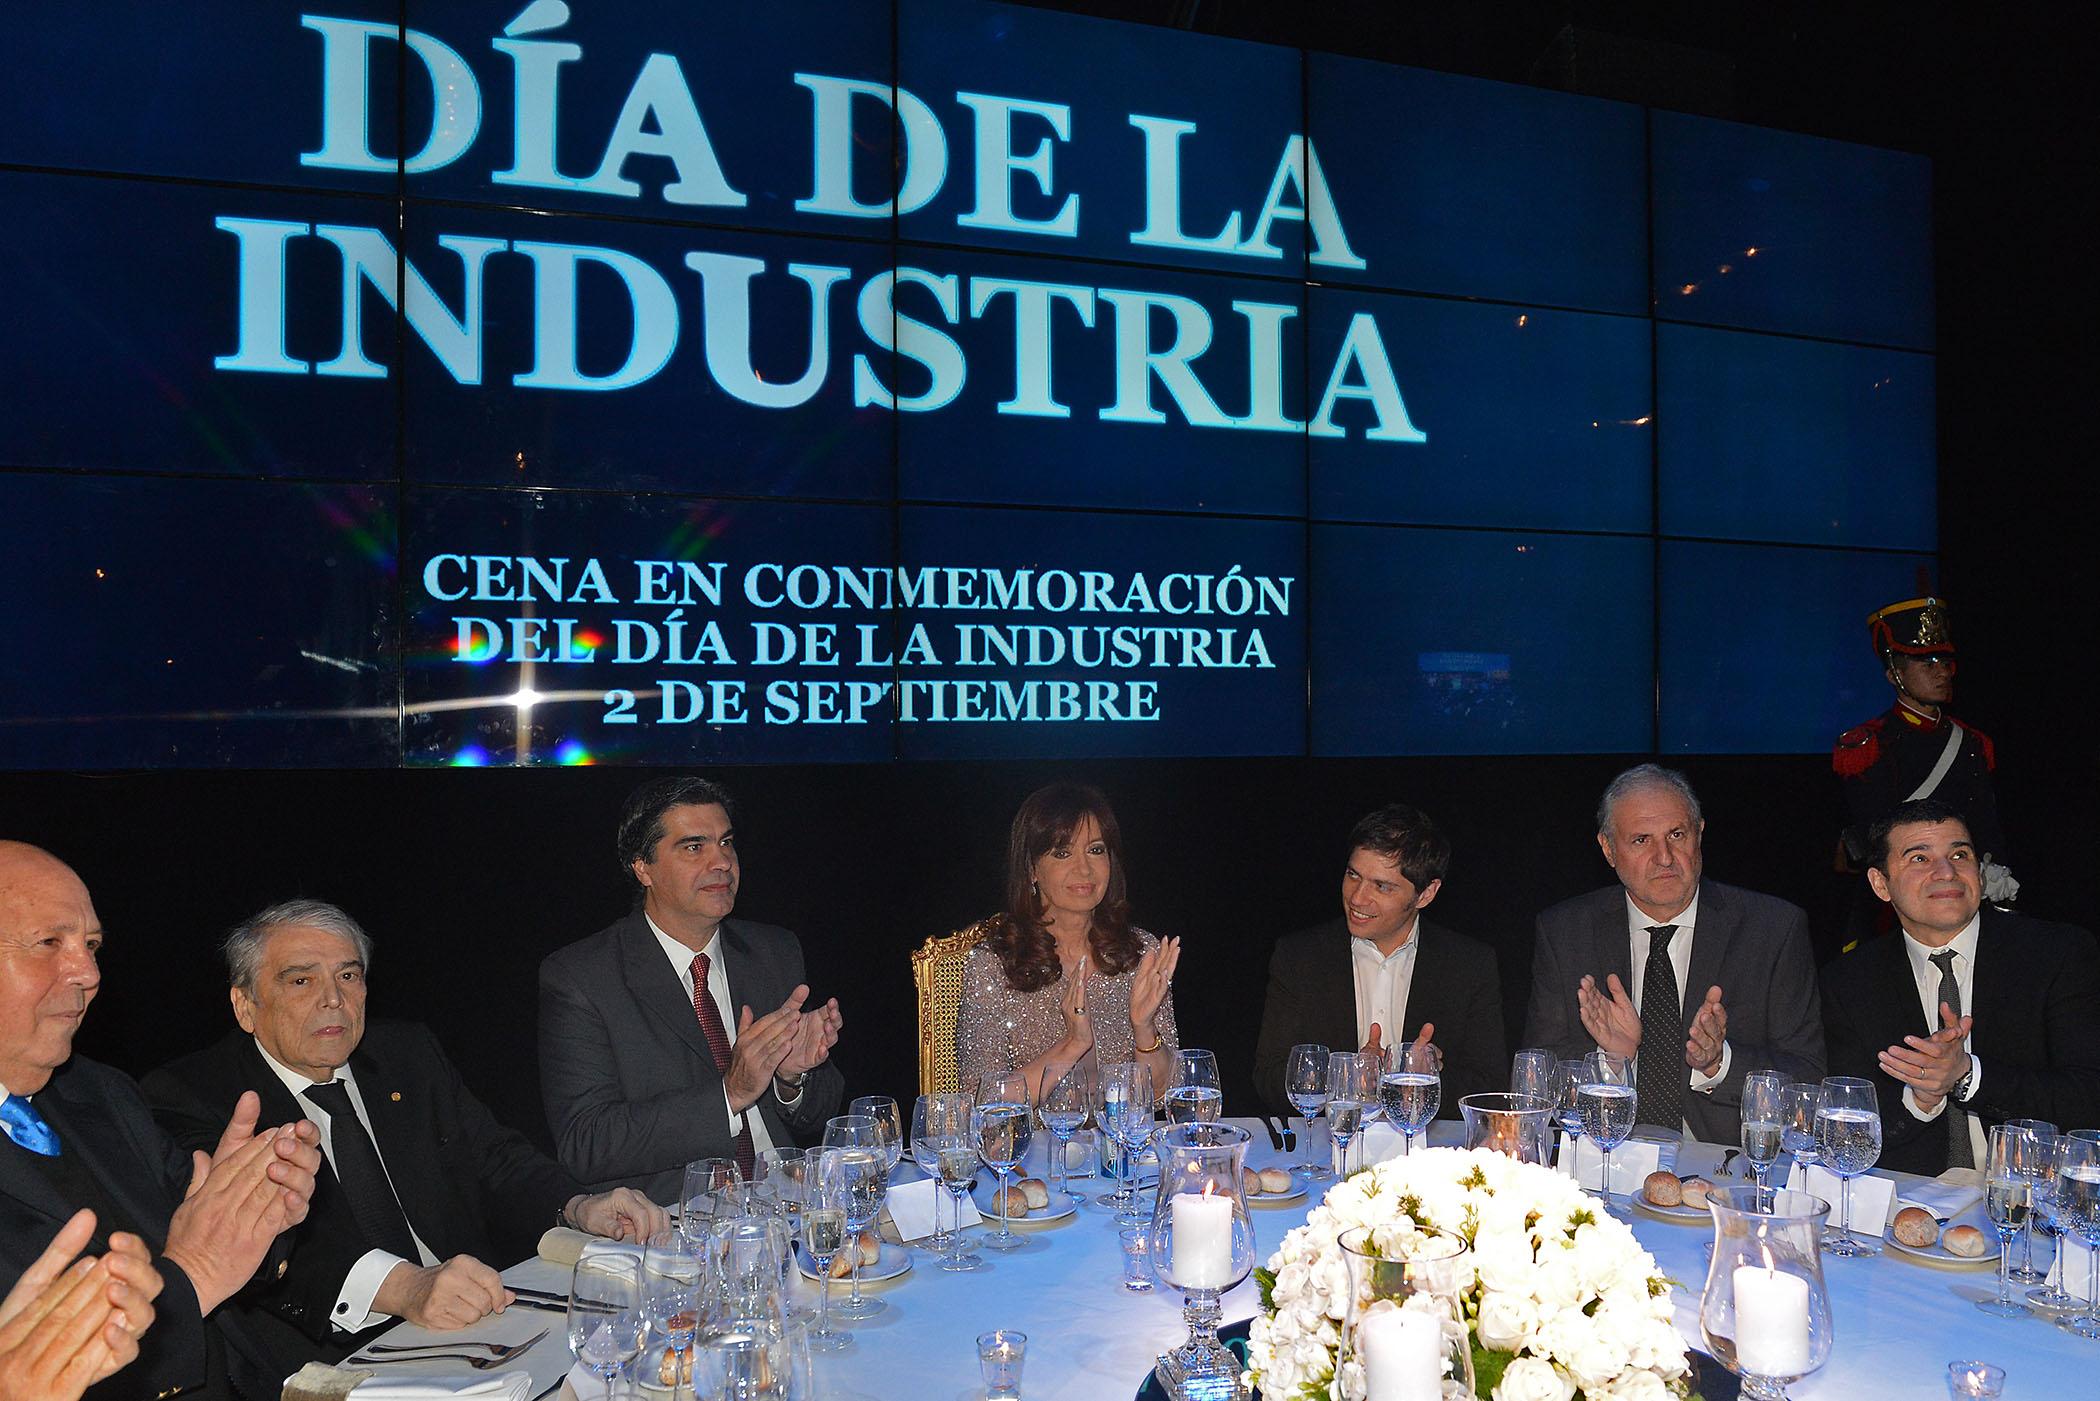 Cristina_DiadelaIndustria_CASAROSADA_01